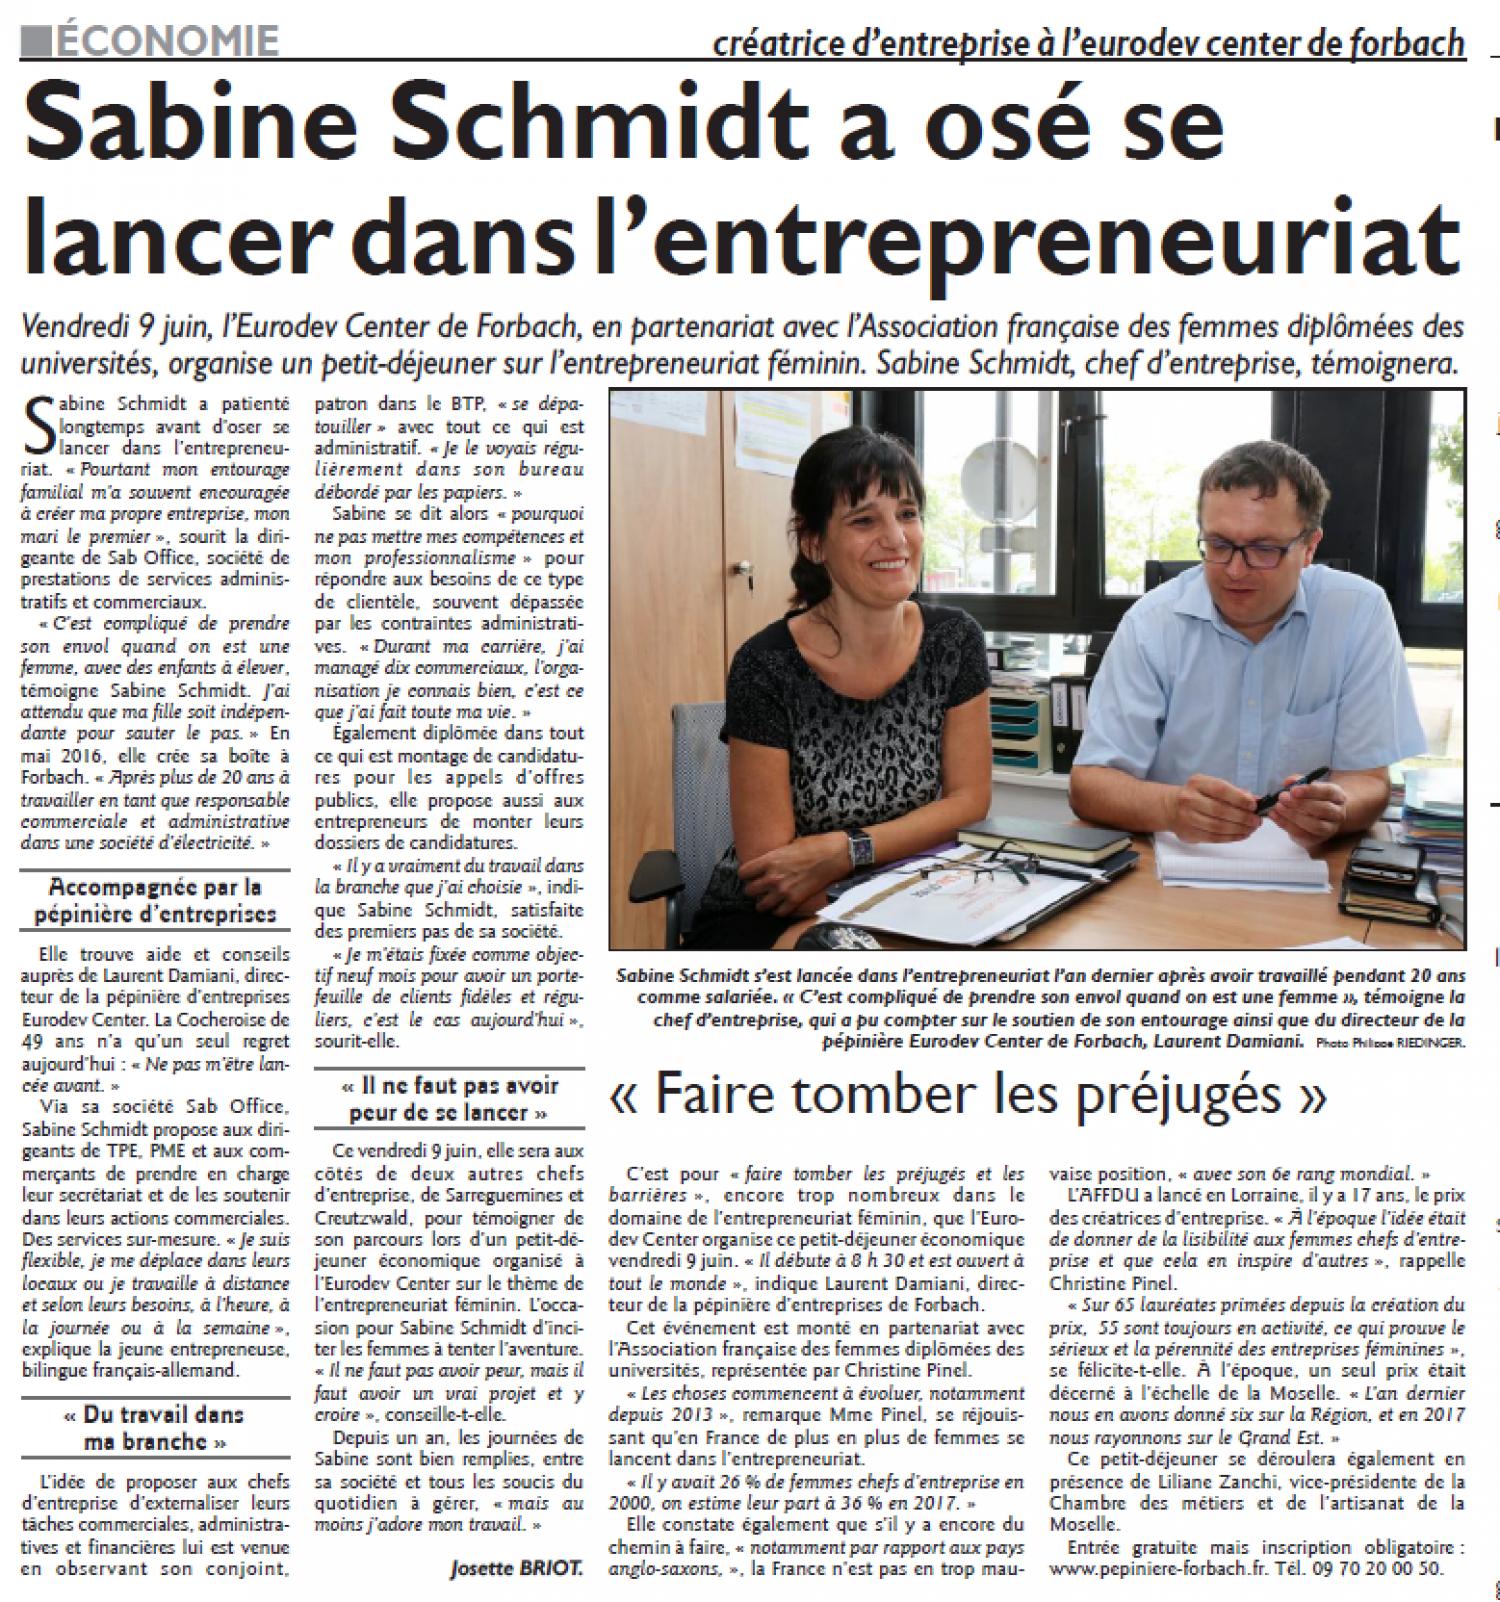 ENTREPRENEURIAT-FEMININ-20170607-SABINE-SCHMIDT